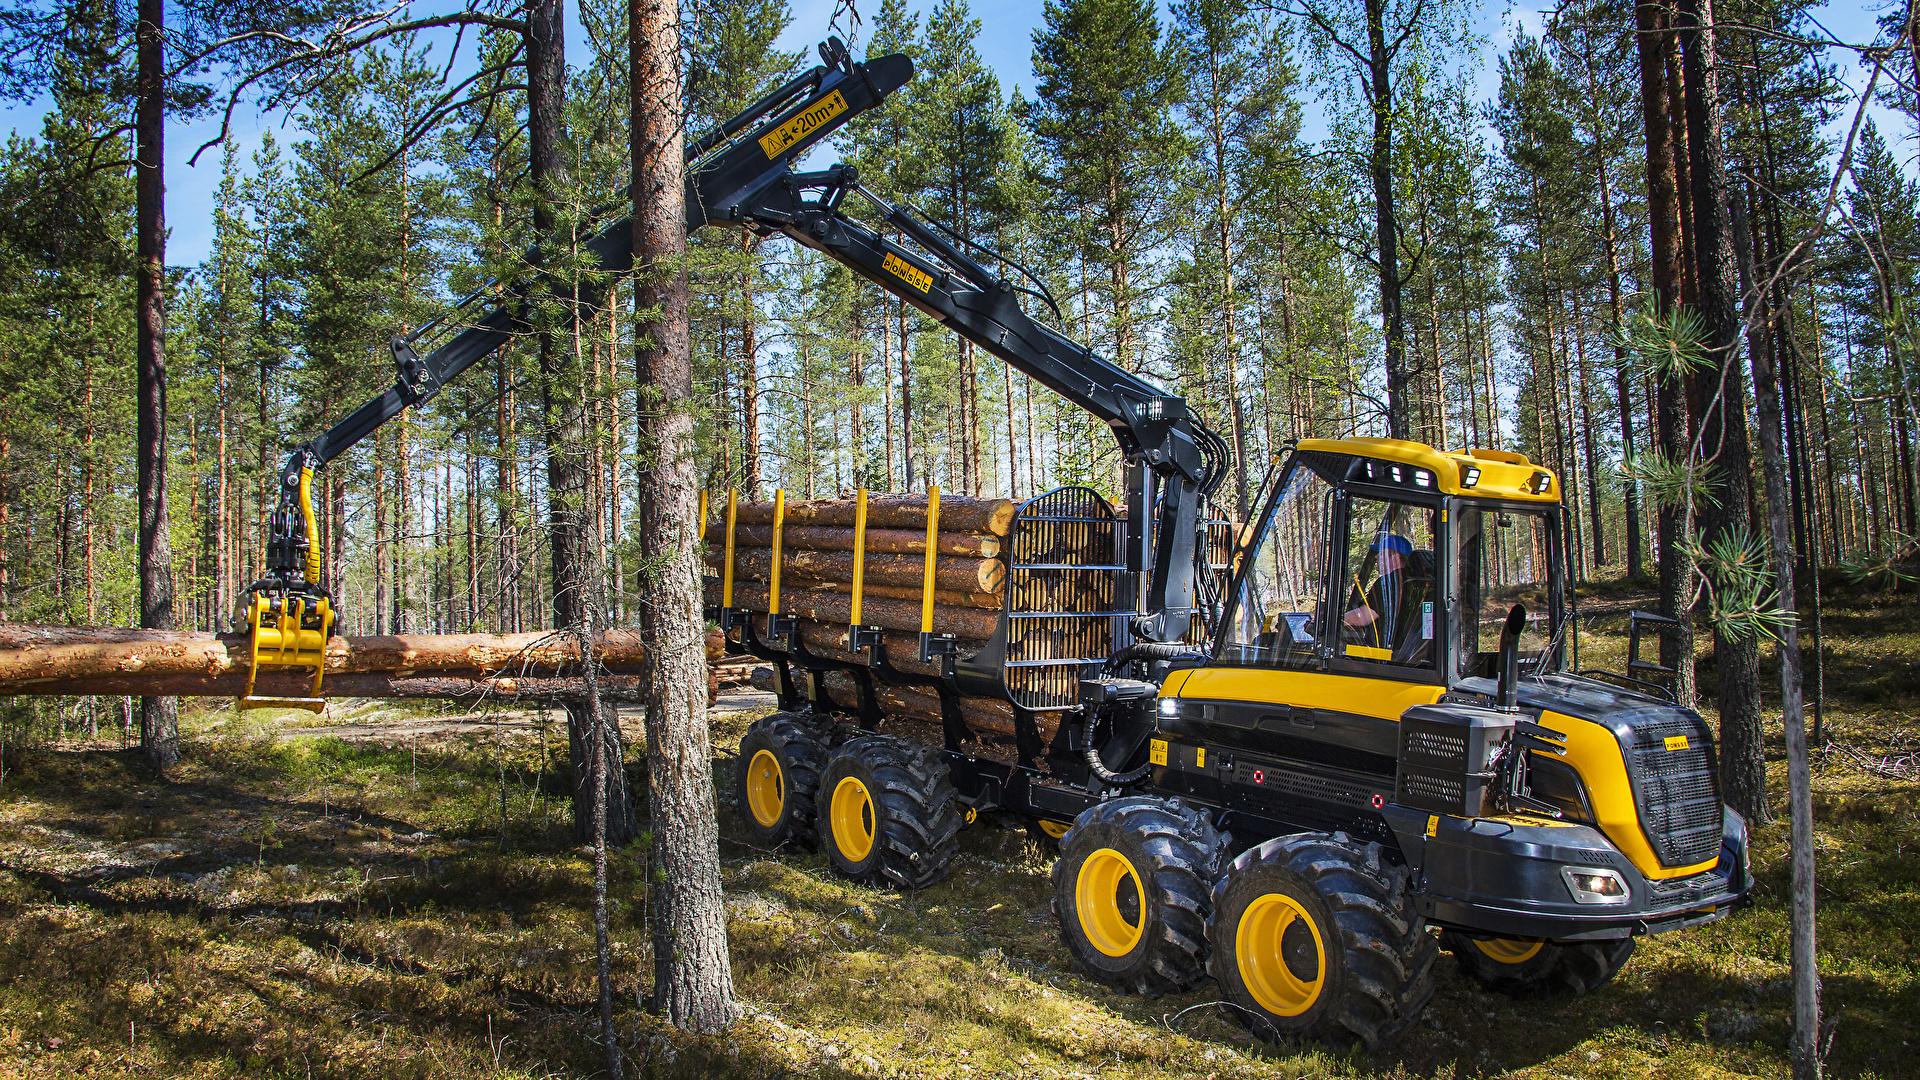 Фотографии Форвардер 2014-17 Ponsse Wisent 8w бревно лес 1920x1080 Бревна Леса